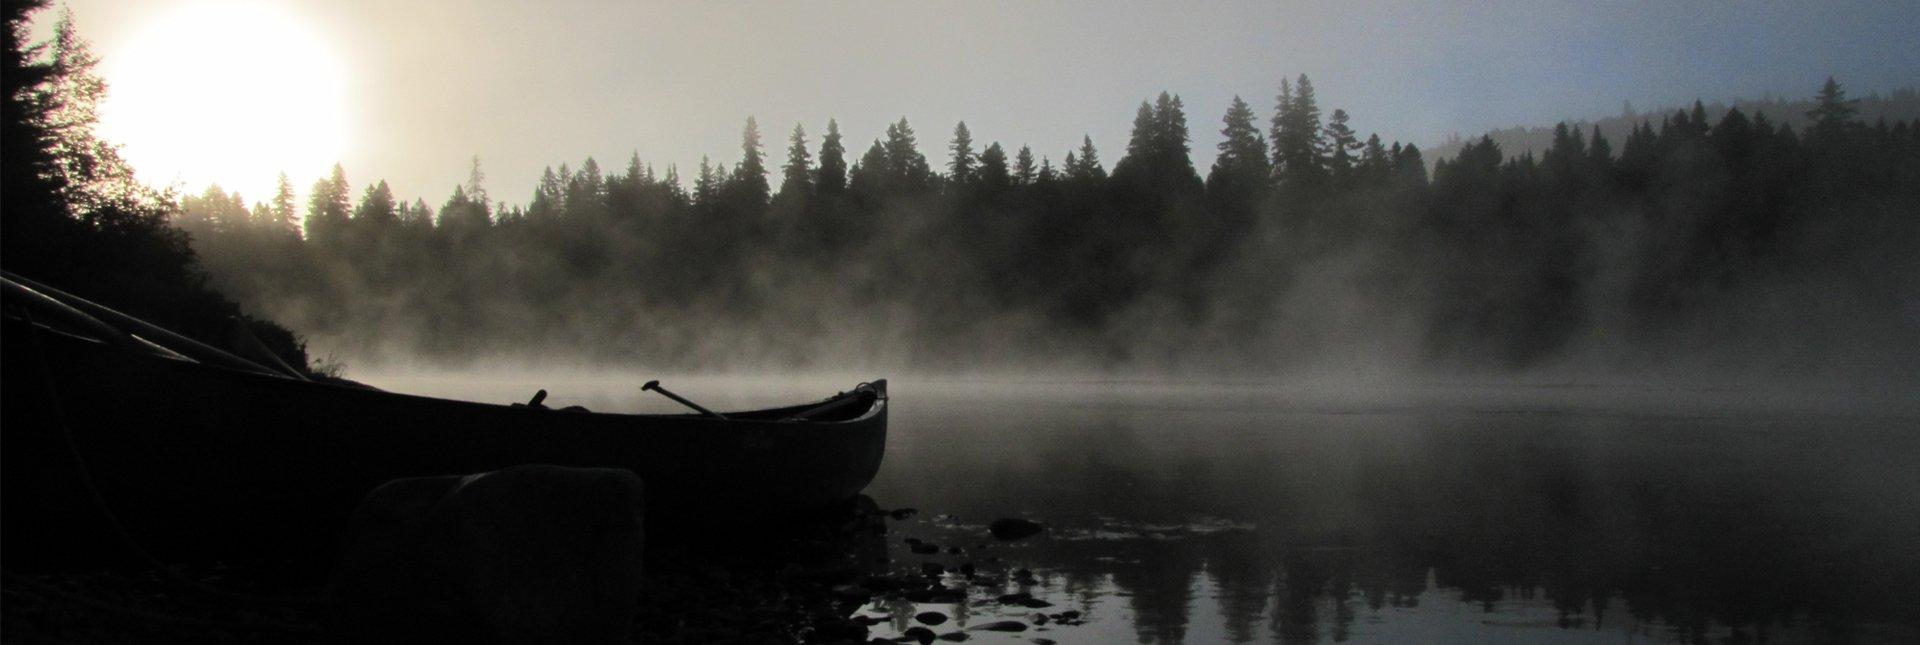 canoe-gallery